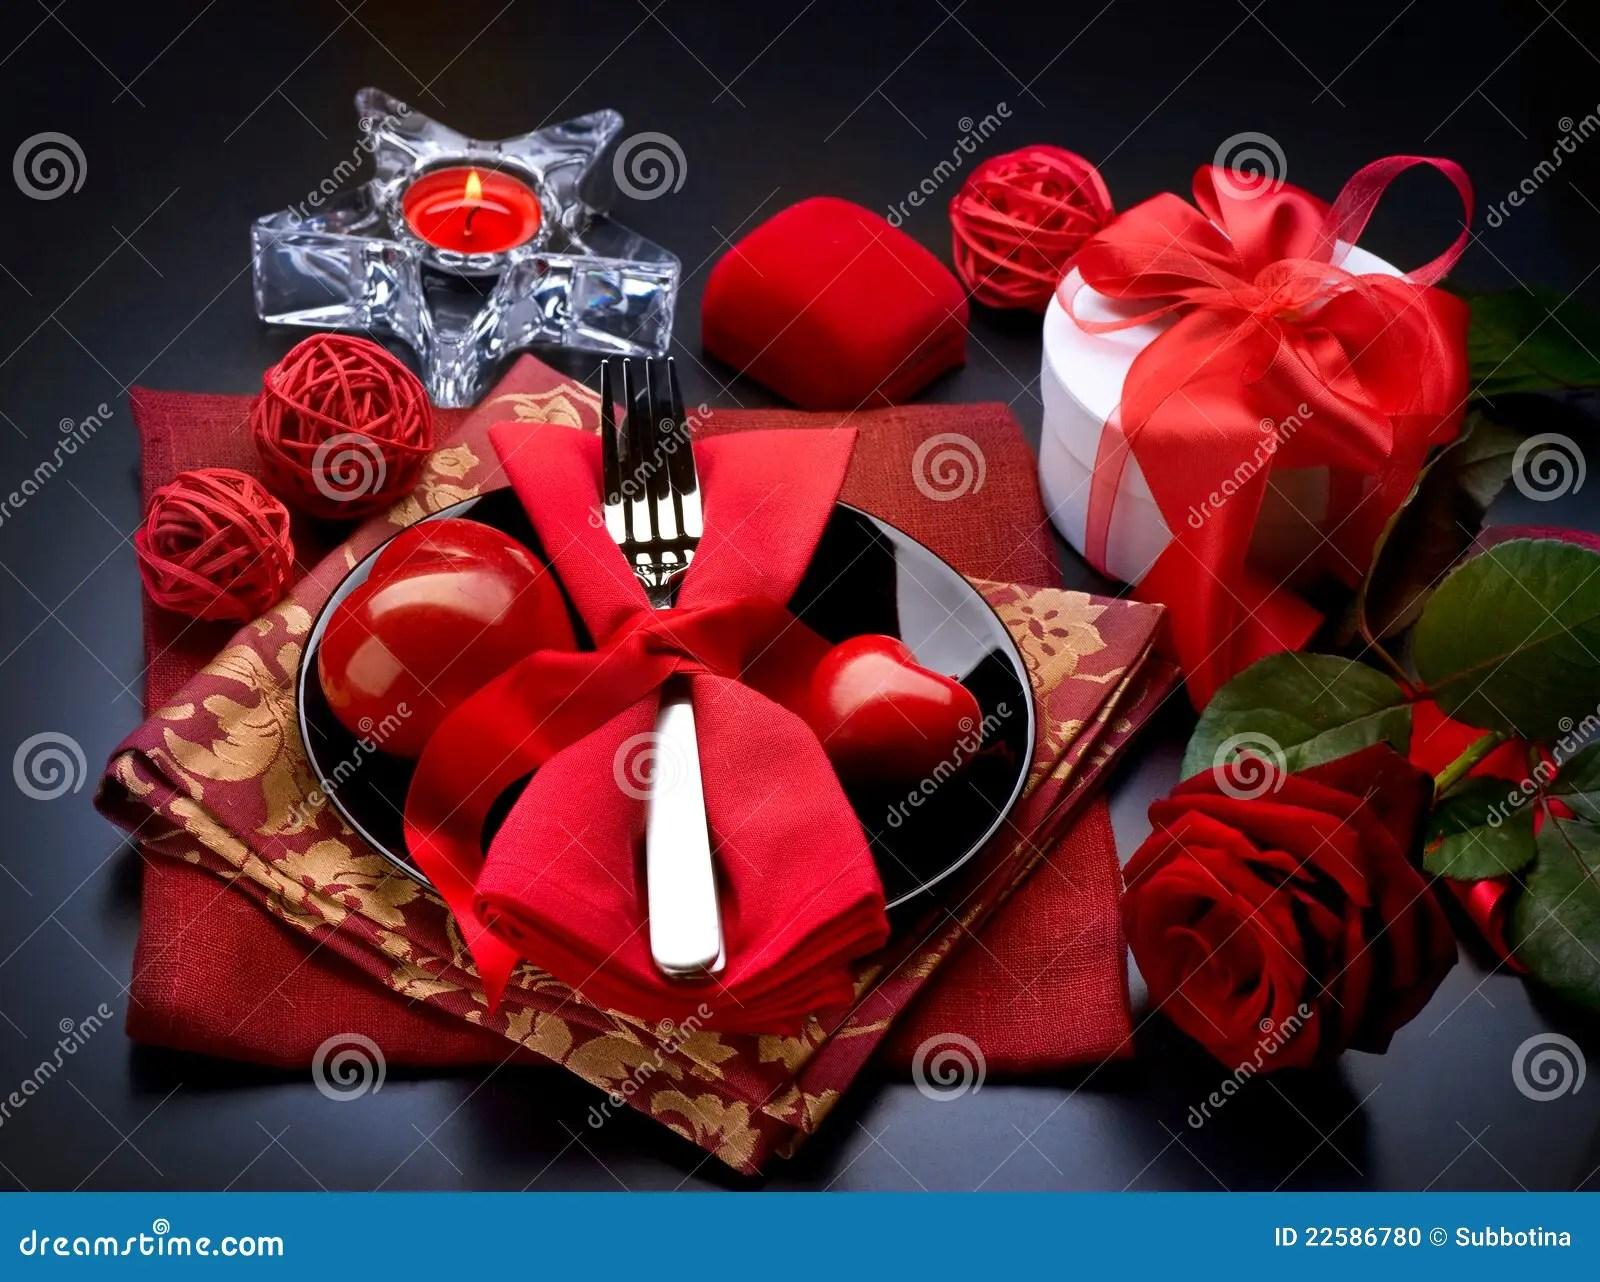 Romantic Dinner Valentines Day Stock Photo Image 22586780